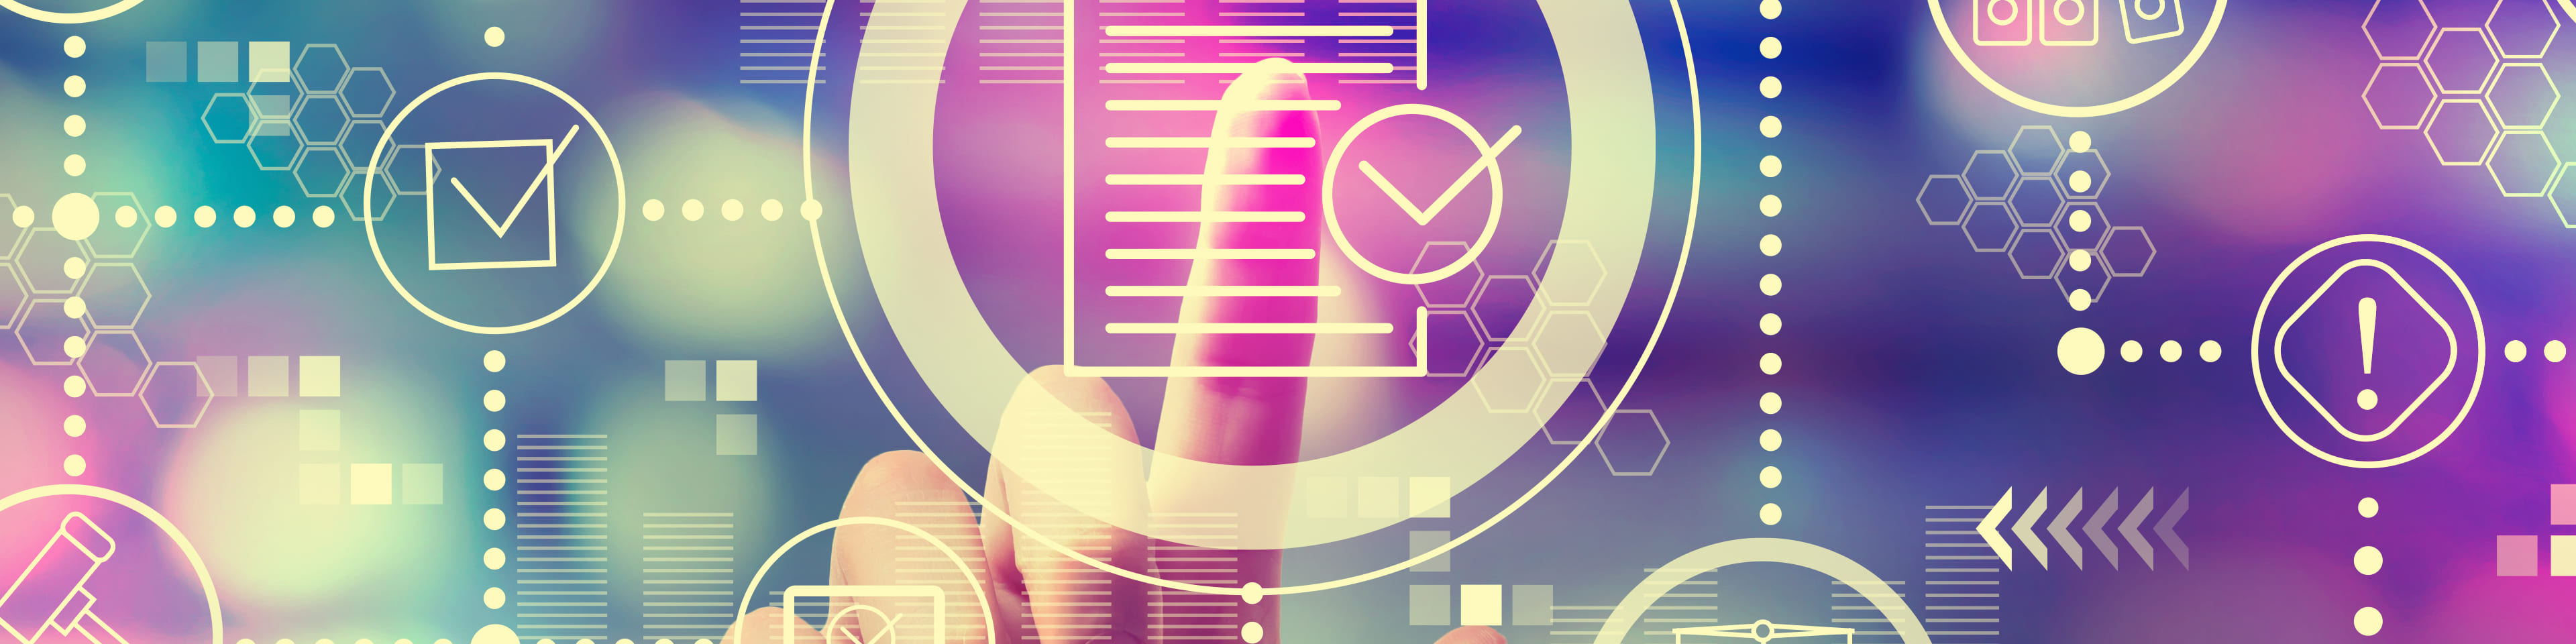 Legisway_legal tech implementation steps